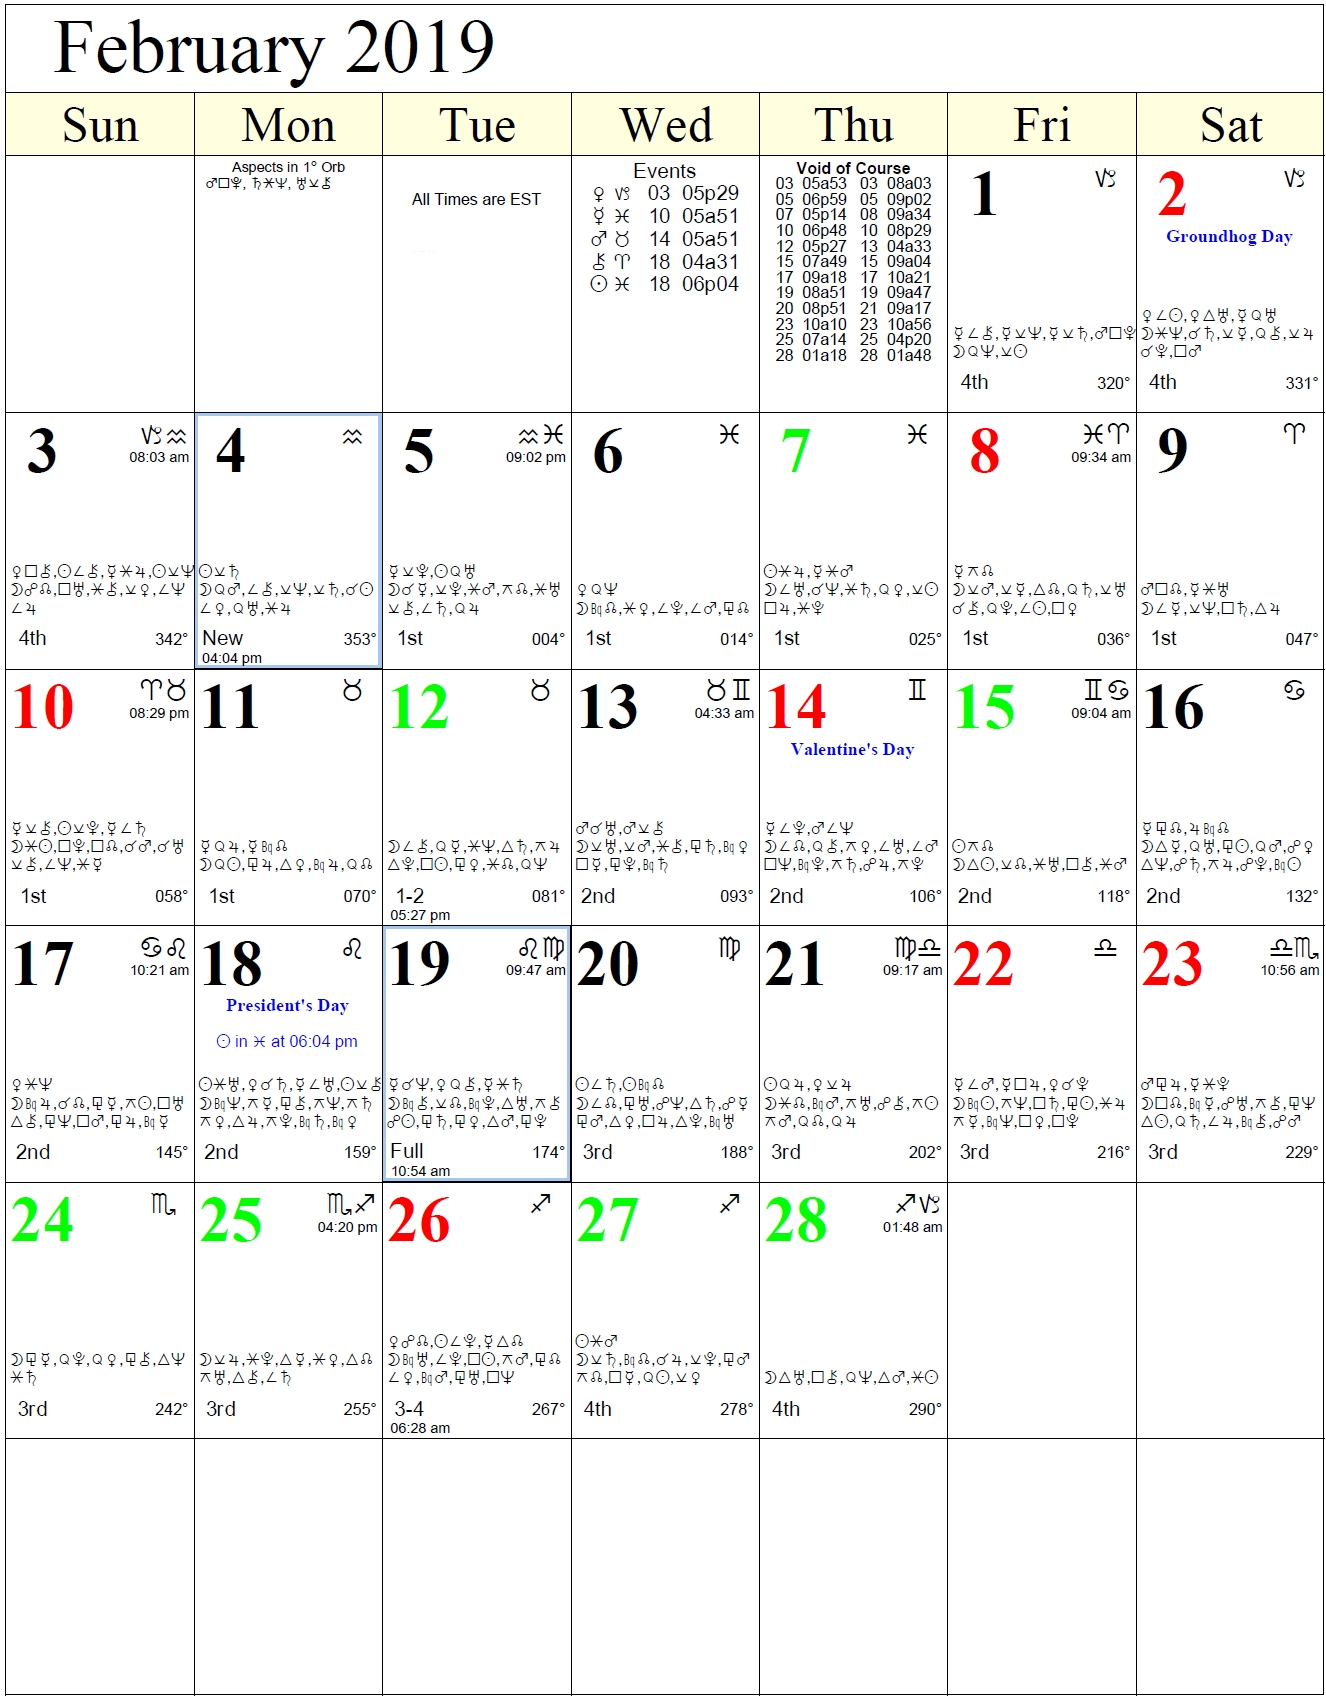 Monthly Astrology Calendars February 4 2019 Calendar